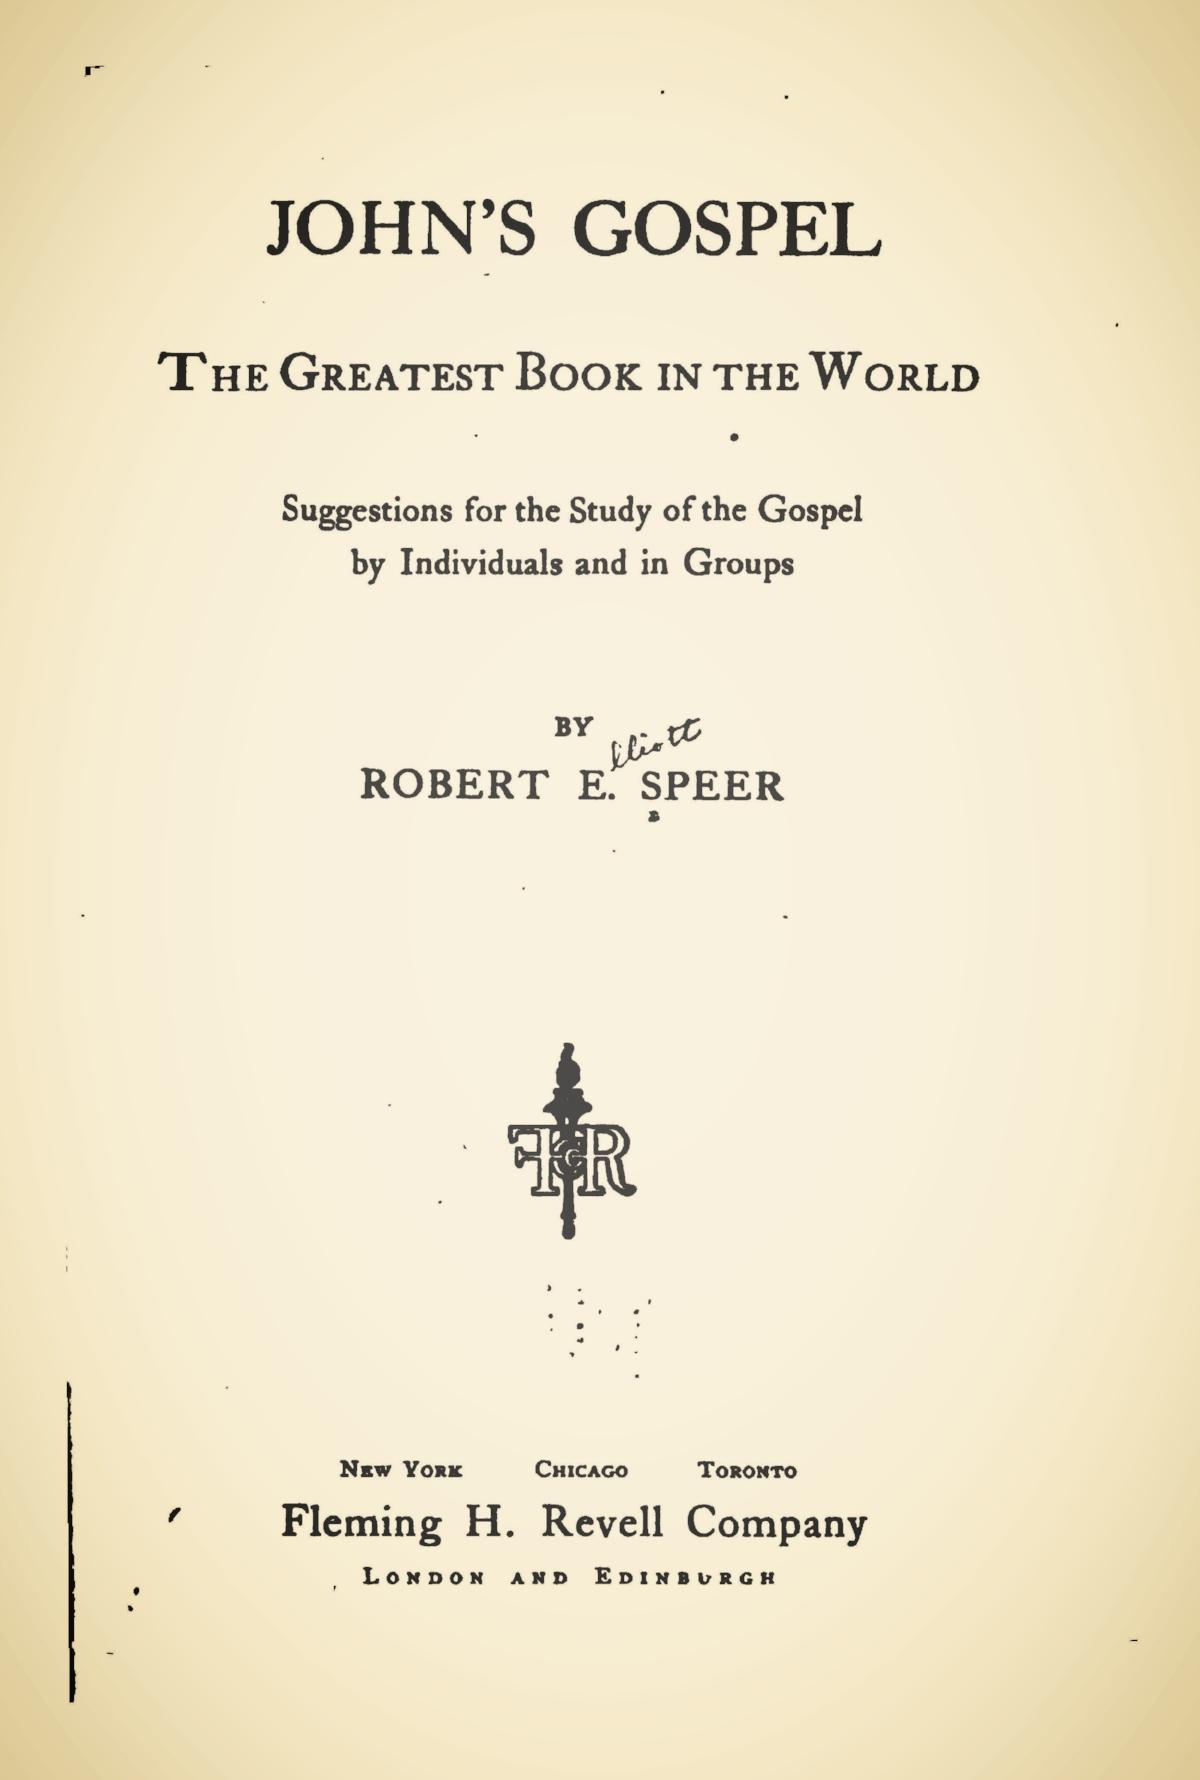 Speer, Robert Elliott, John's Gospel The Greatest Book in the World Title Page.jpg